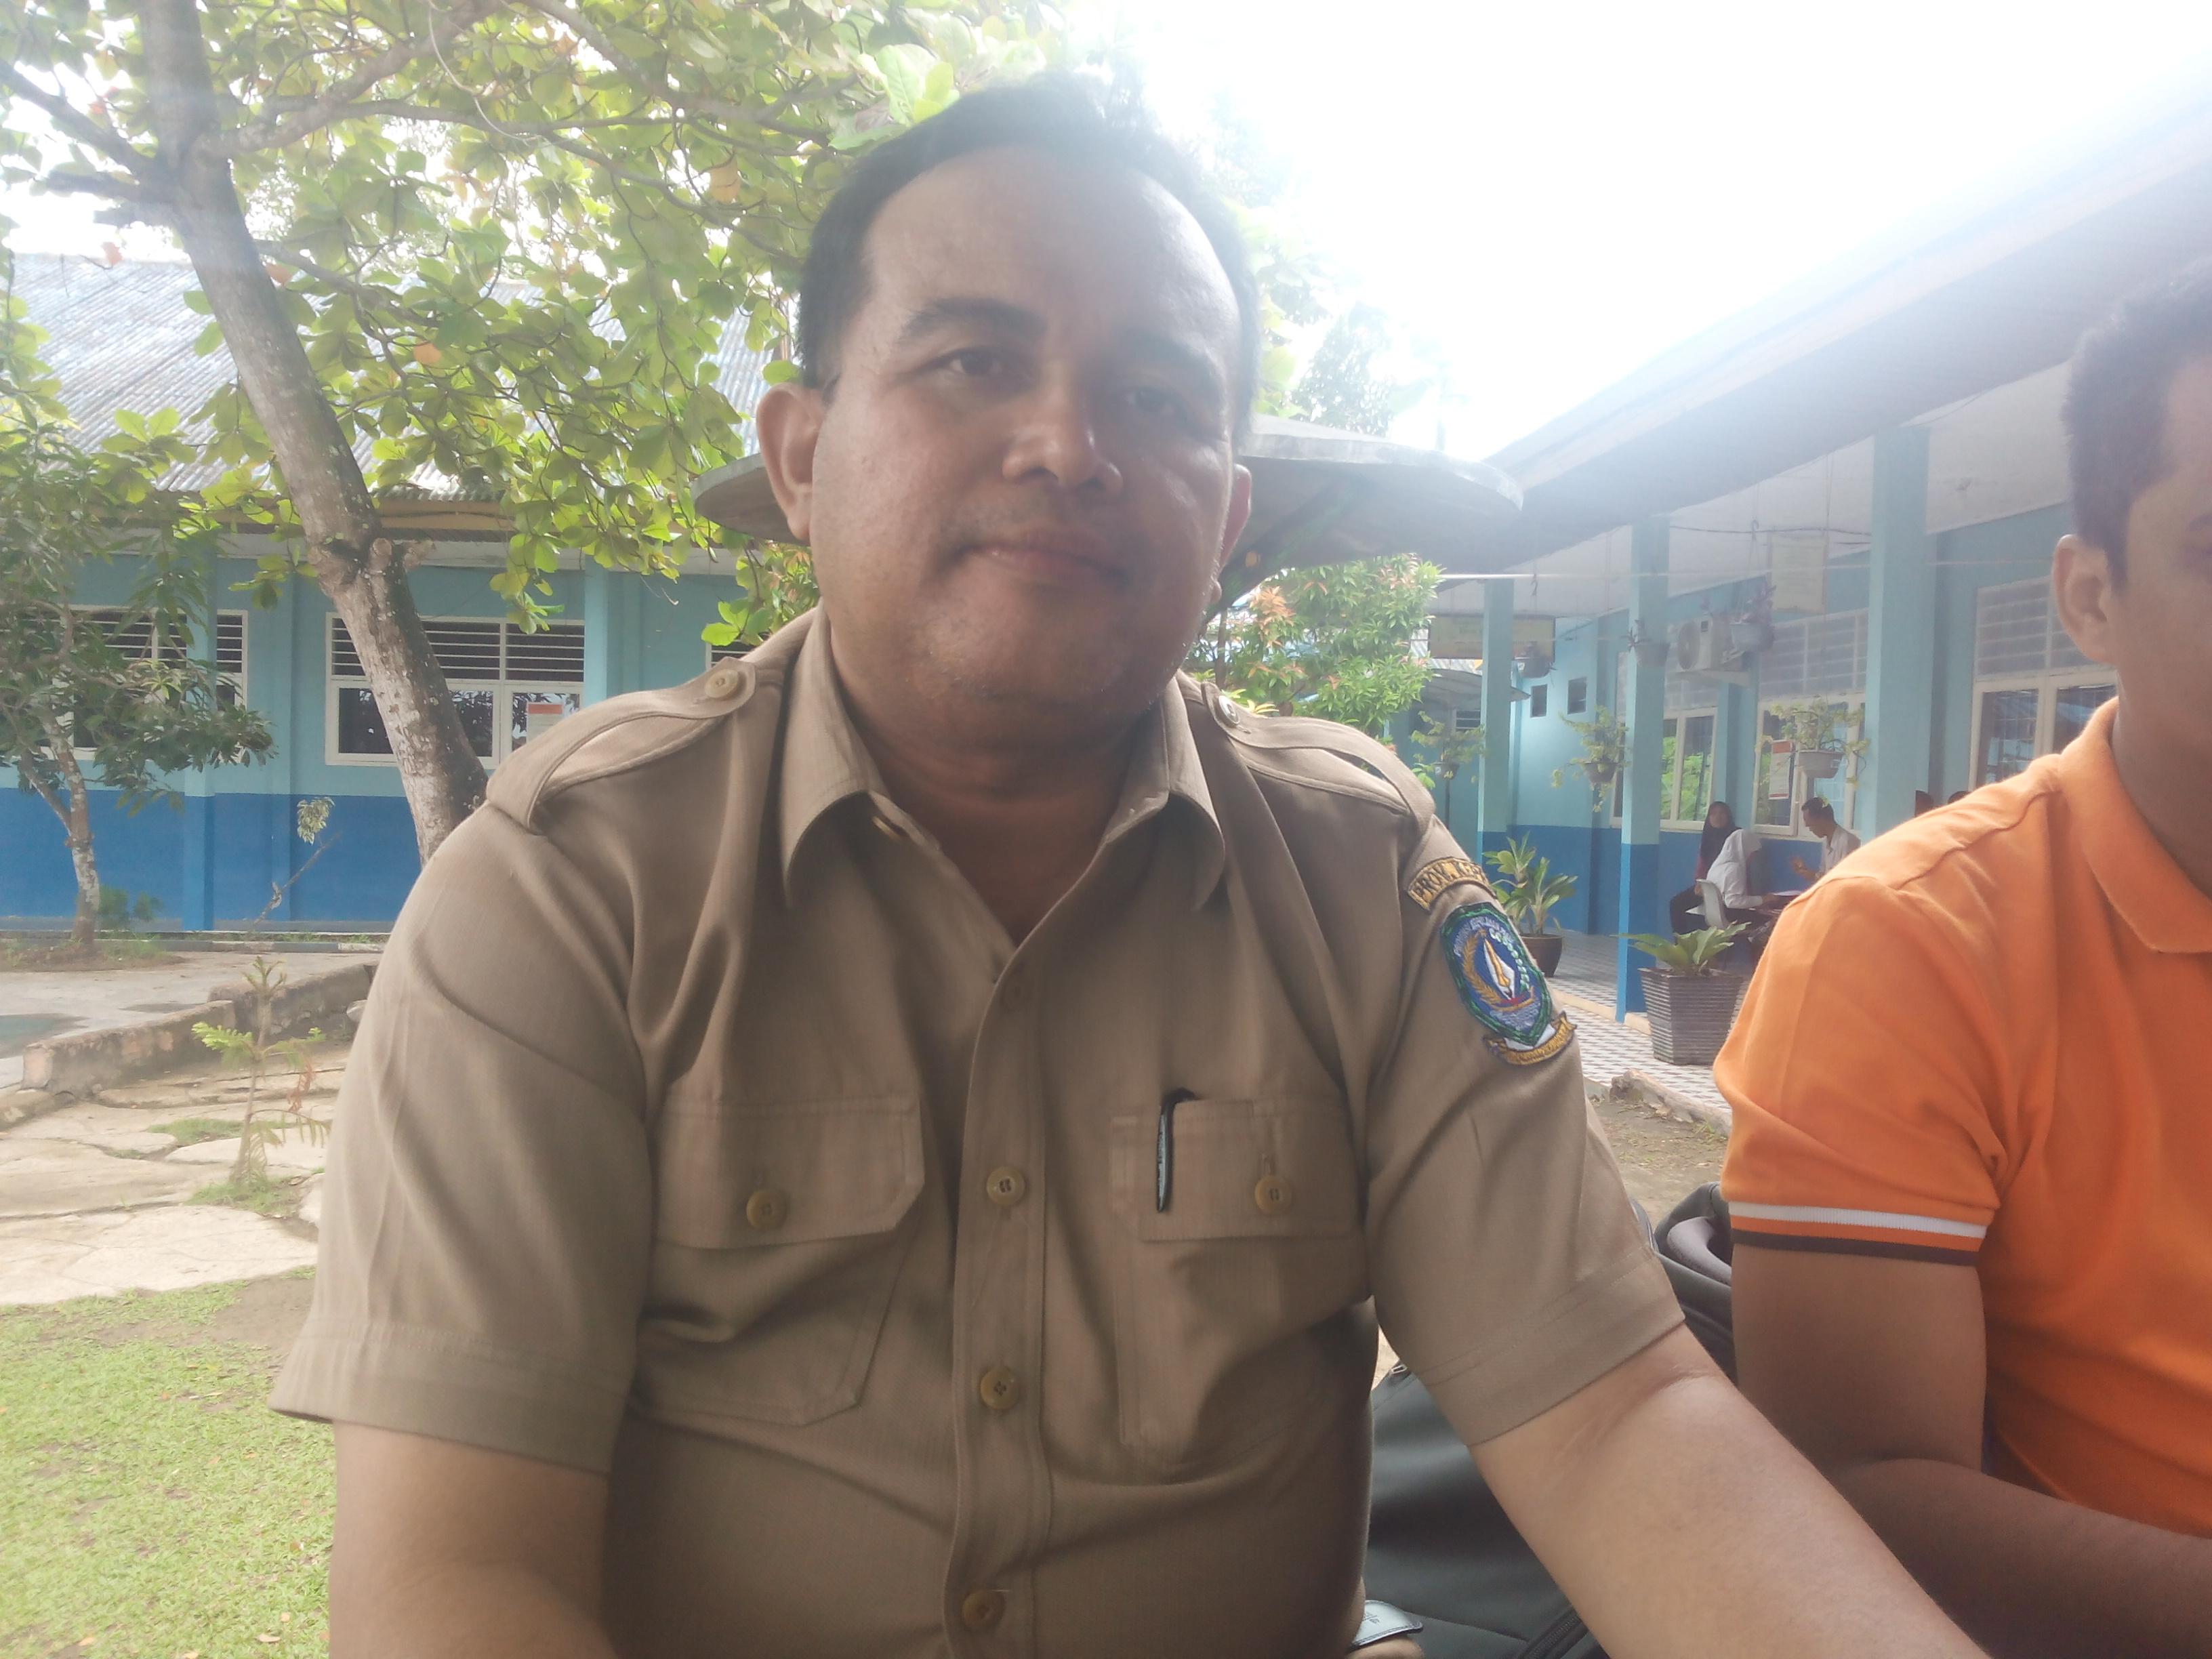 Kepala Sekolah Sman 5 Beri Rasa Adil Bagi Masyarakat Independen News